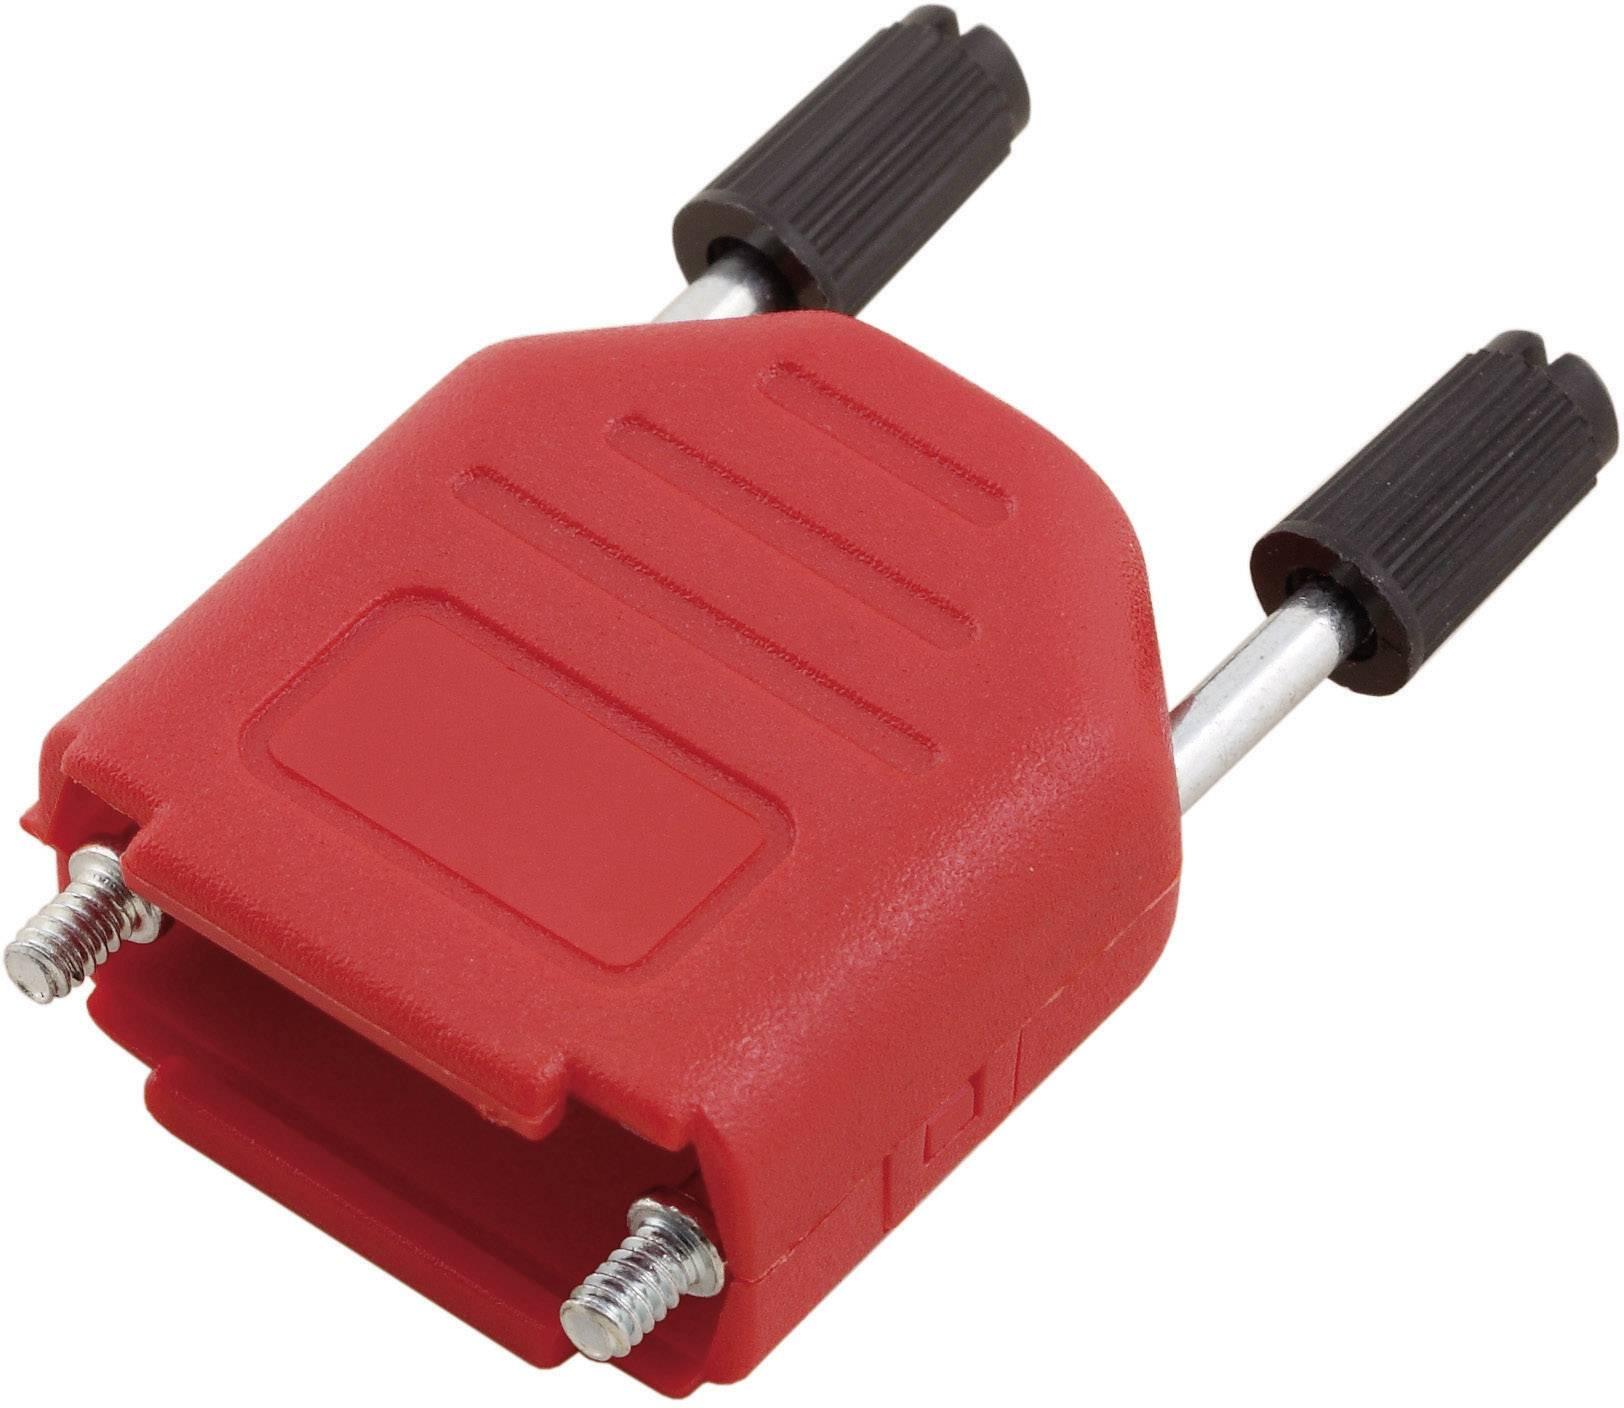 D-SUB púzdro MH Connectors MHDPPK15-R-K 6353-0103-02, Počet pinov: 15, plast, 180 °, červená, 1 ks